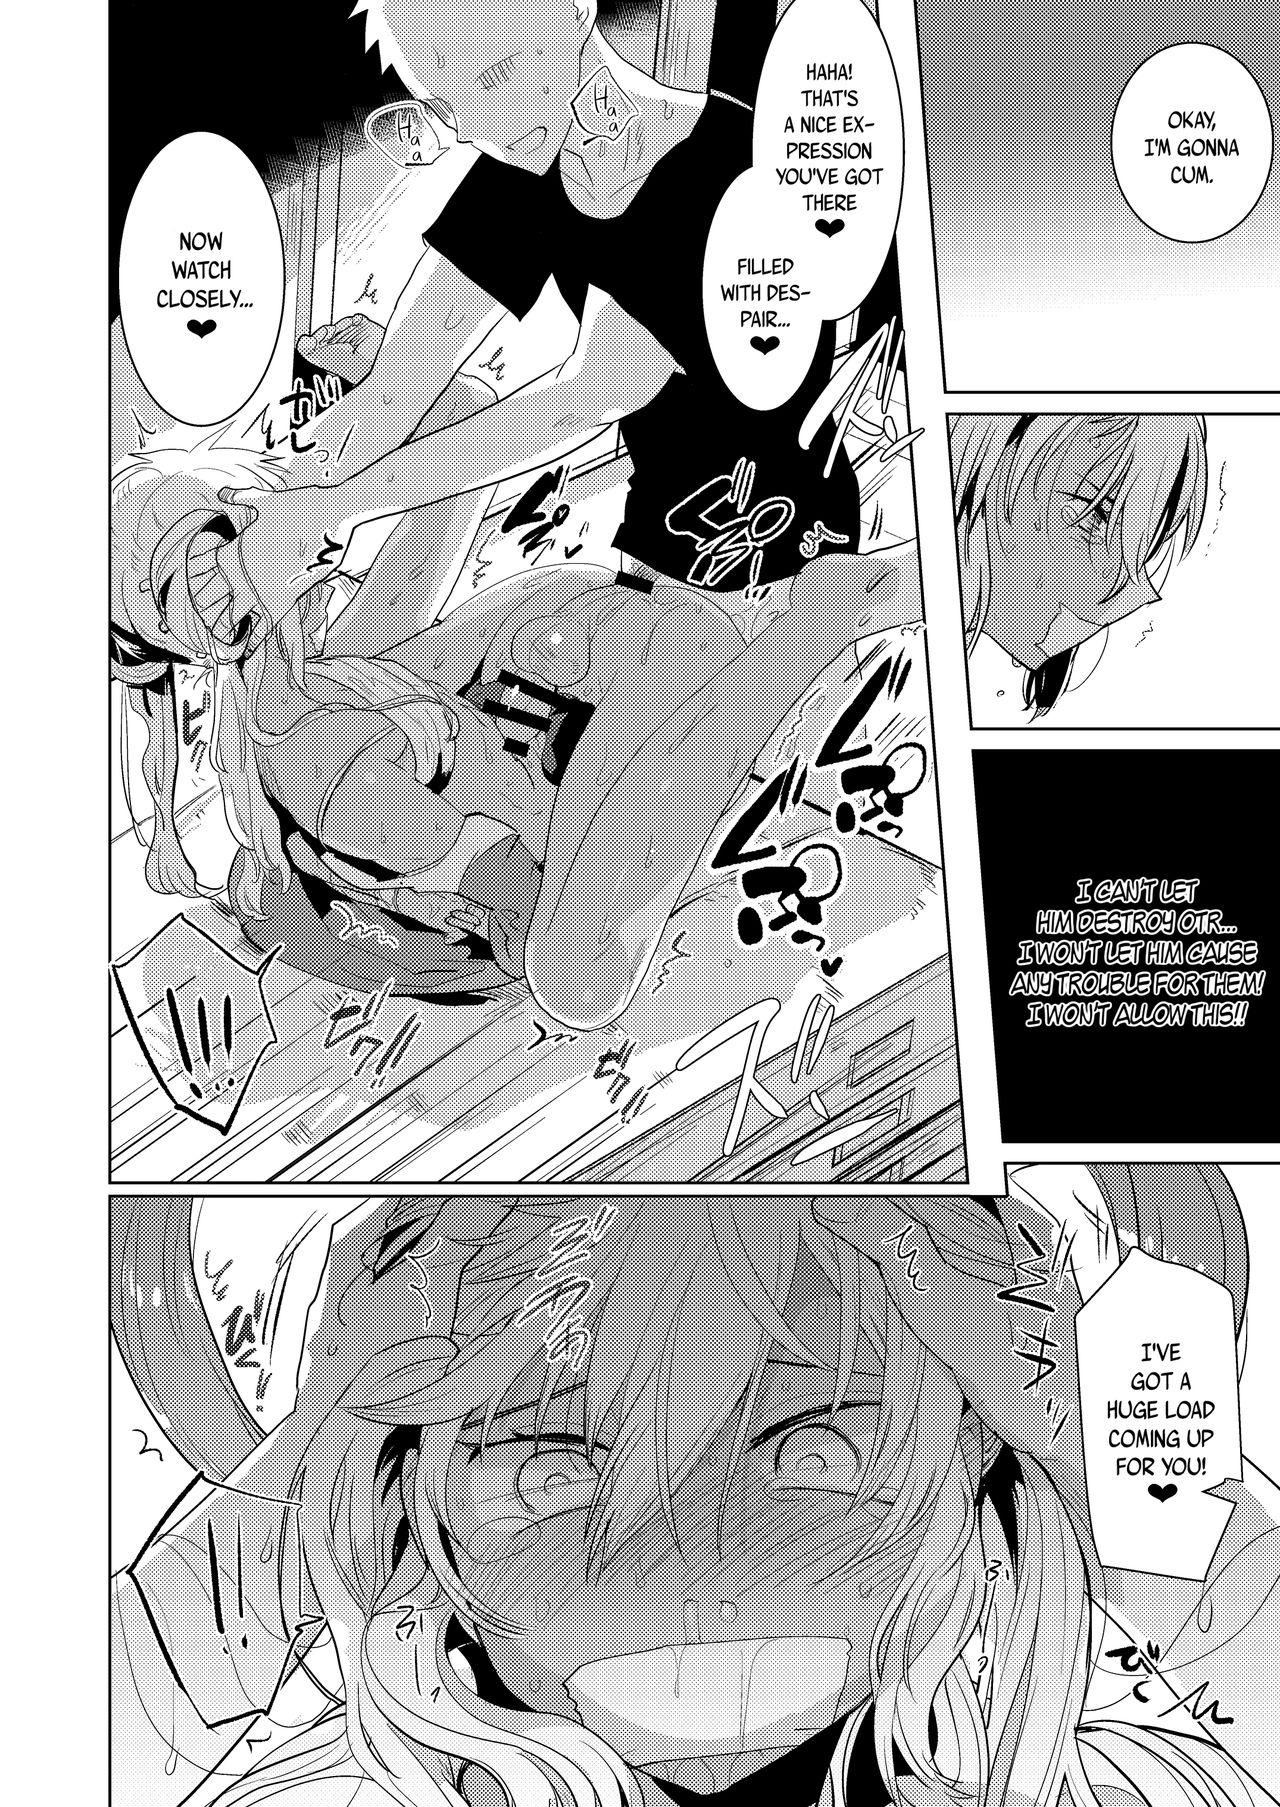 [Aimaitei (Aimaitei Umami)] Kazuki-senpai no Ero Hon   Kazuki-senpai's Erotic Book (King of Prism by Pretty Rhythm) [English] {CapableScoutMan & B.E.C. Scans} [Digital] 13